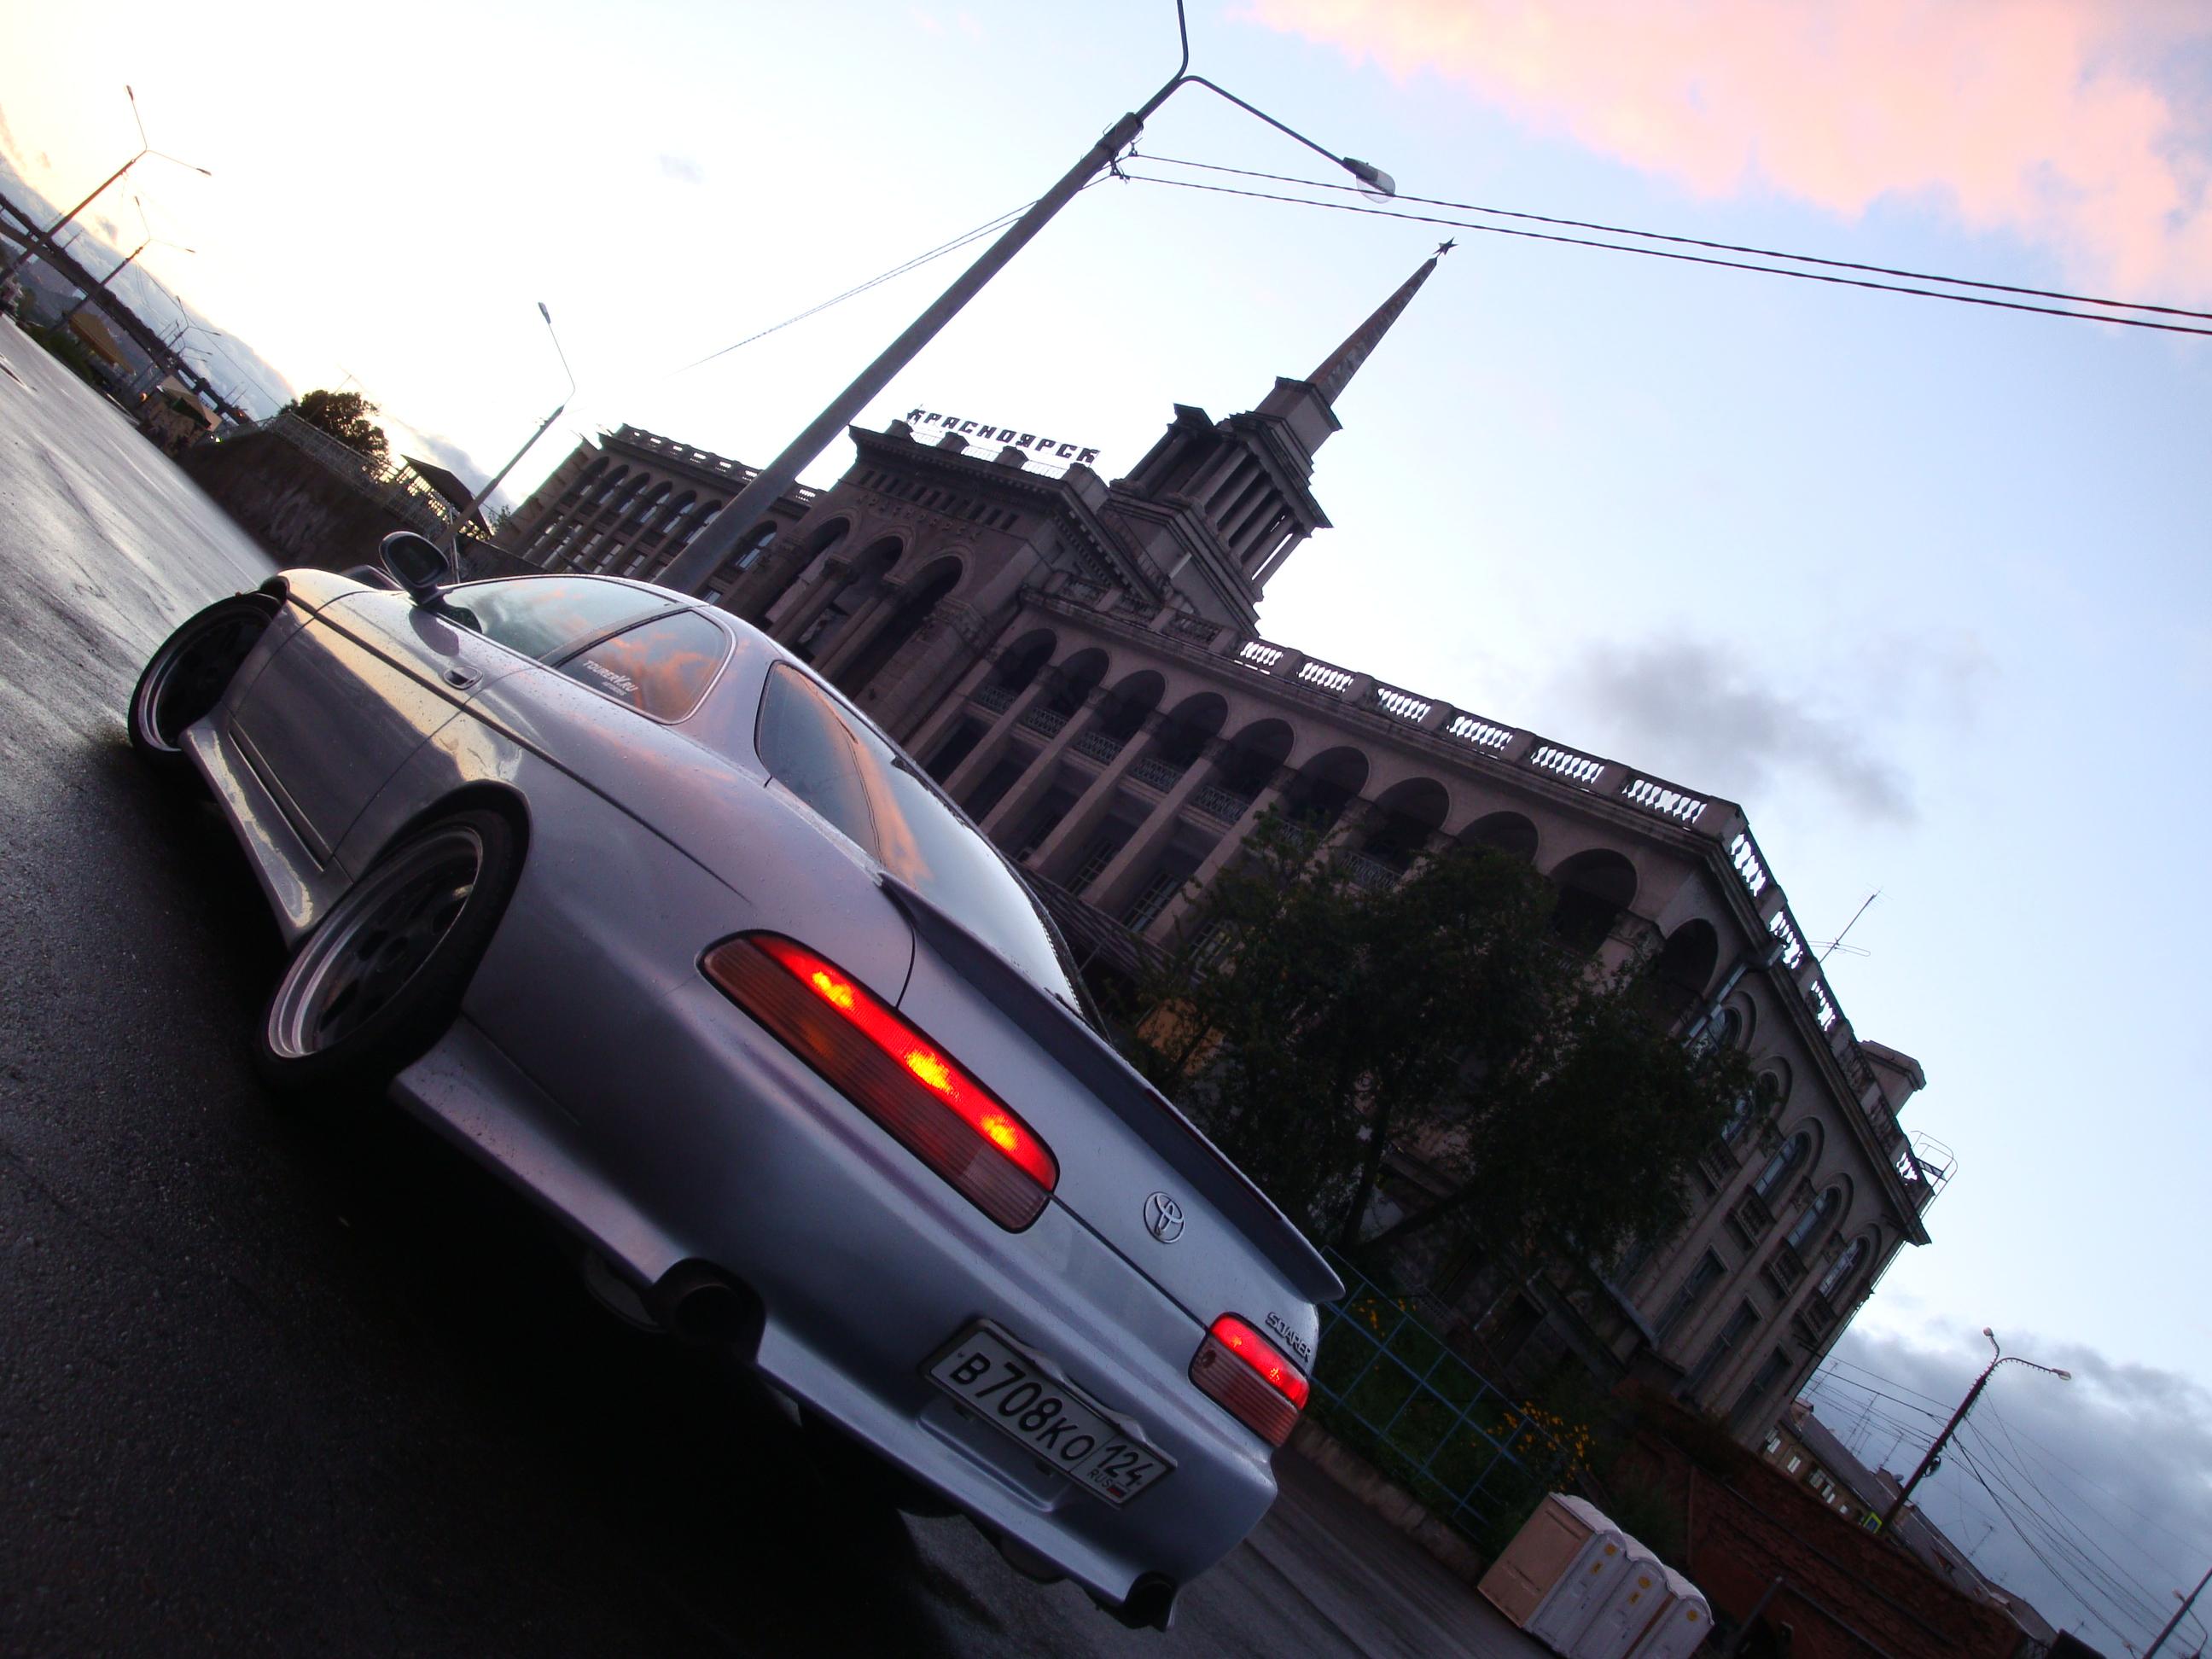 SRR JZZ 30 1 - Grand Theft Auto 5